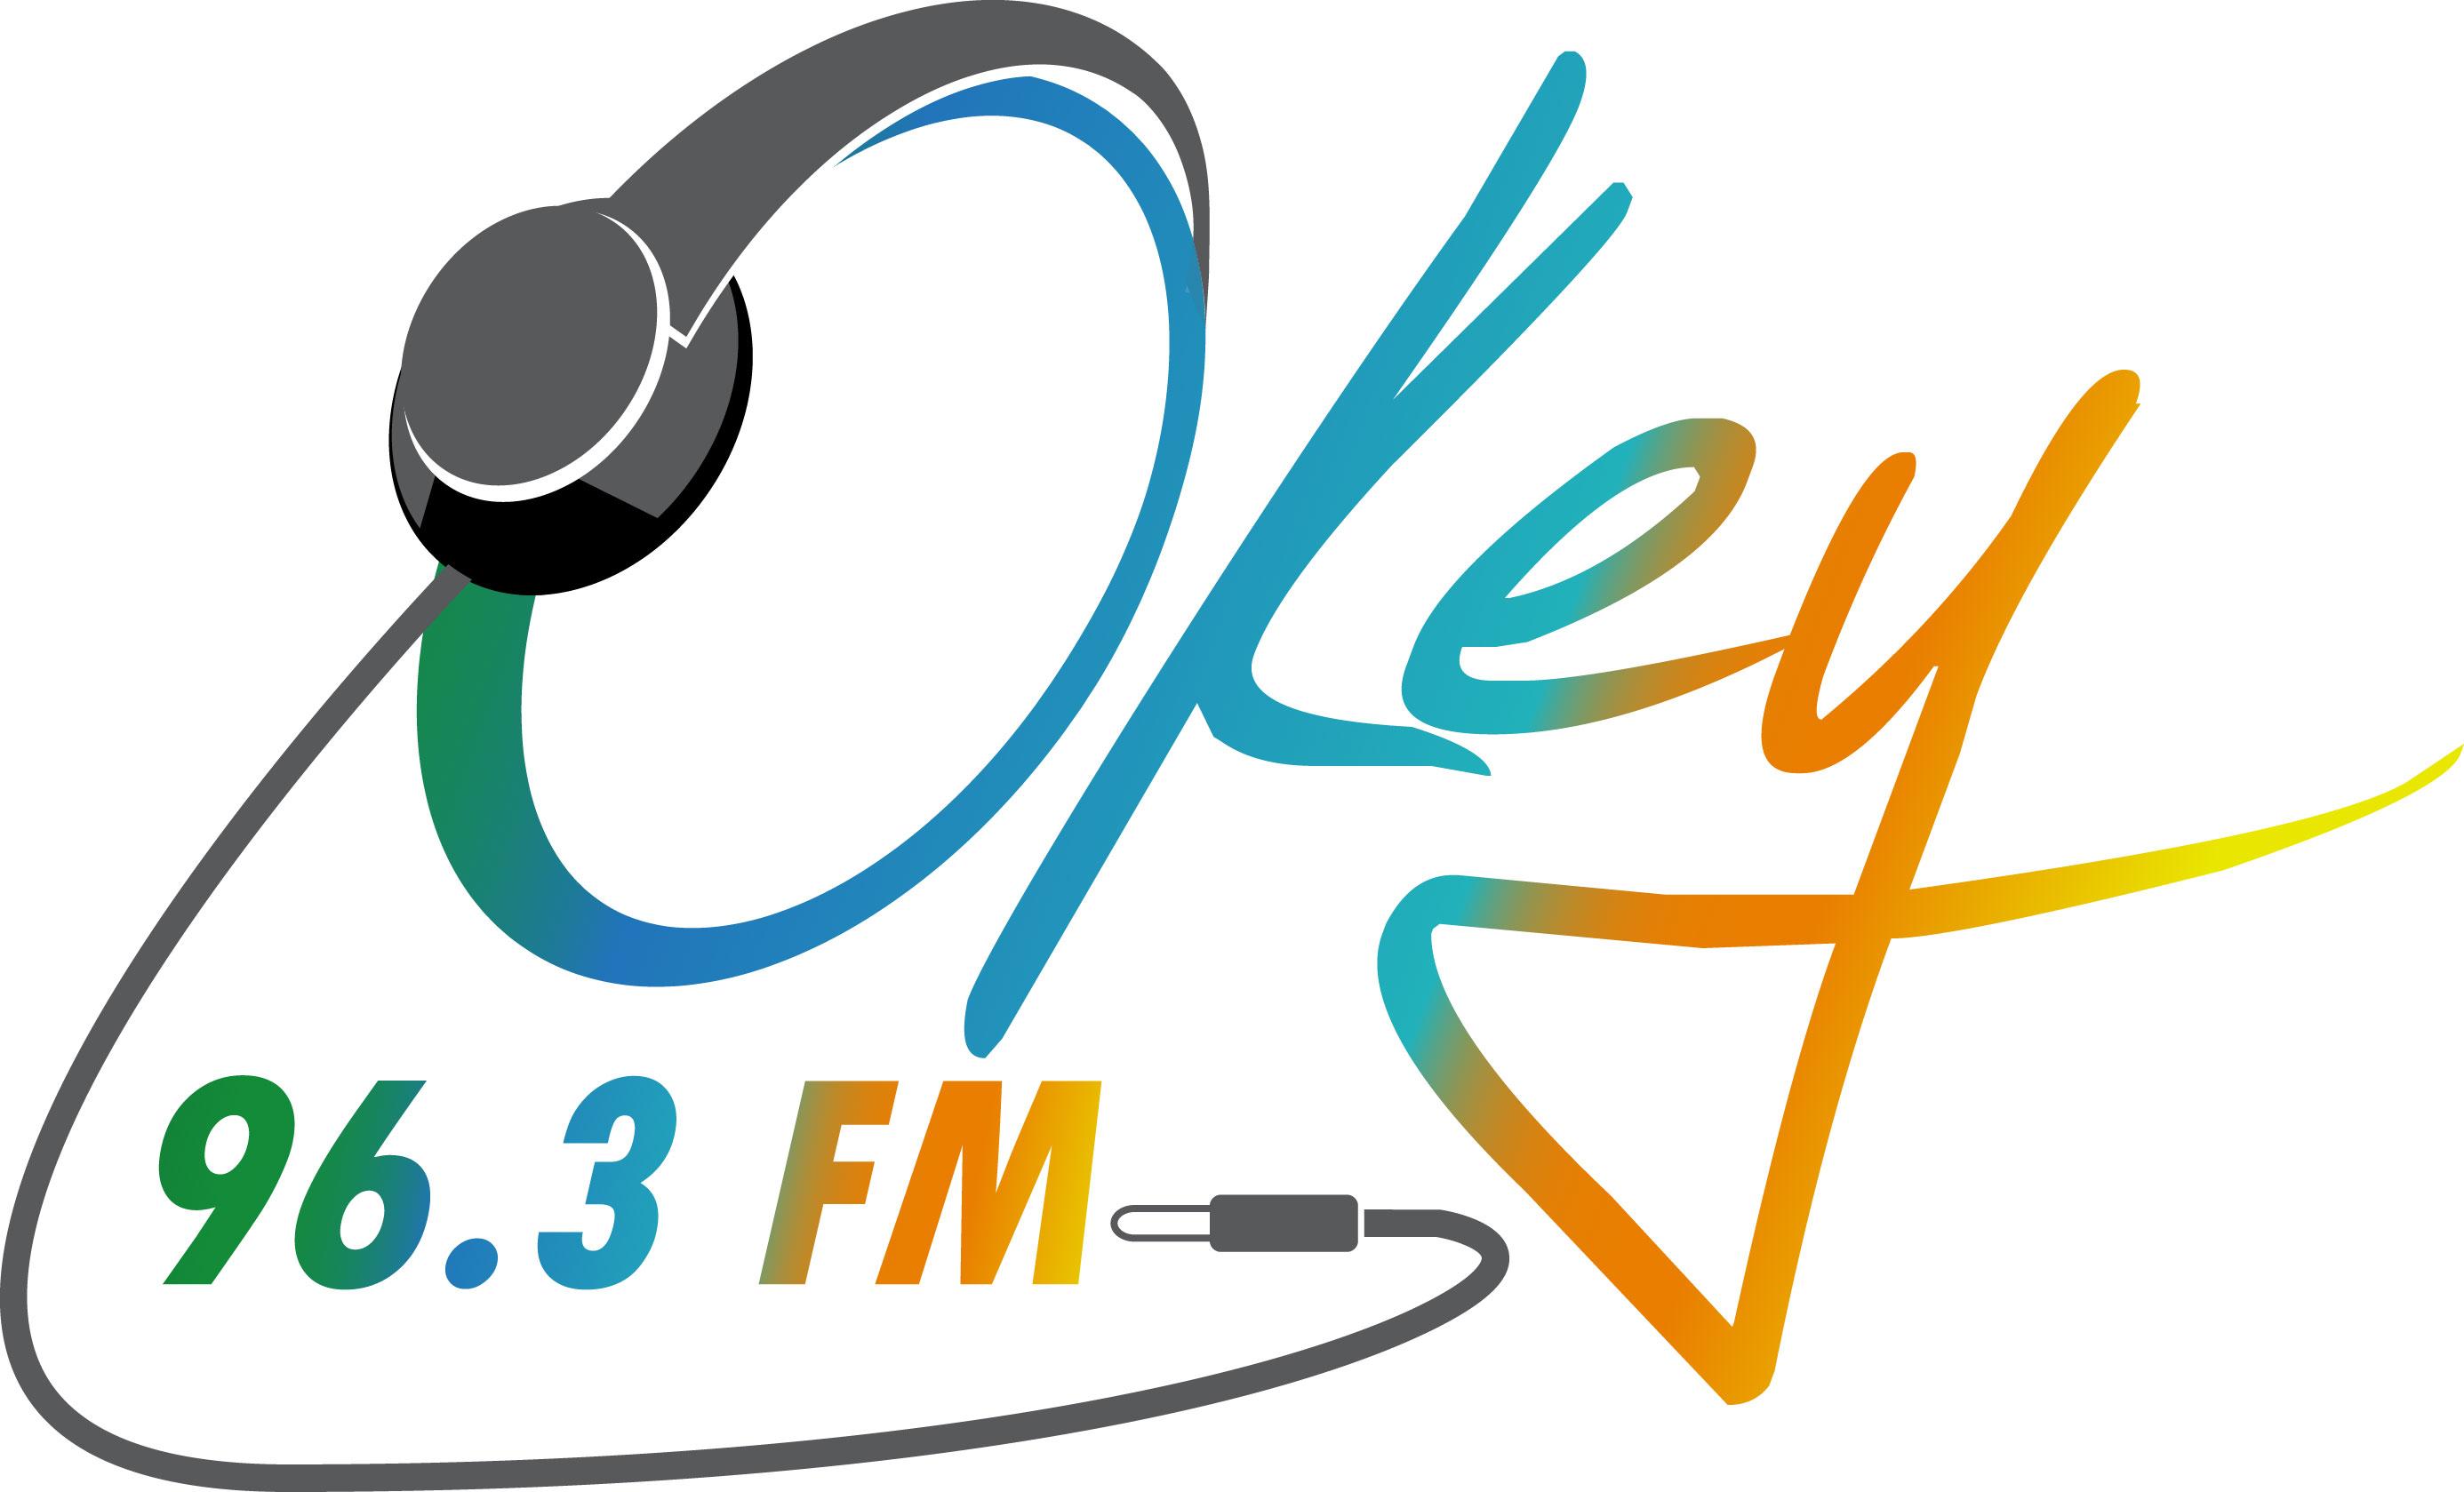 OKEY 96.3 FM